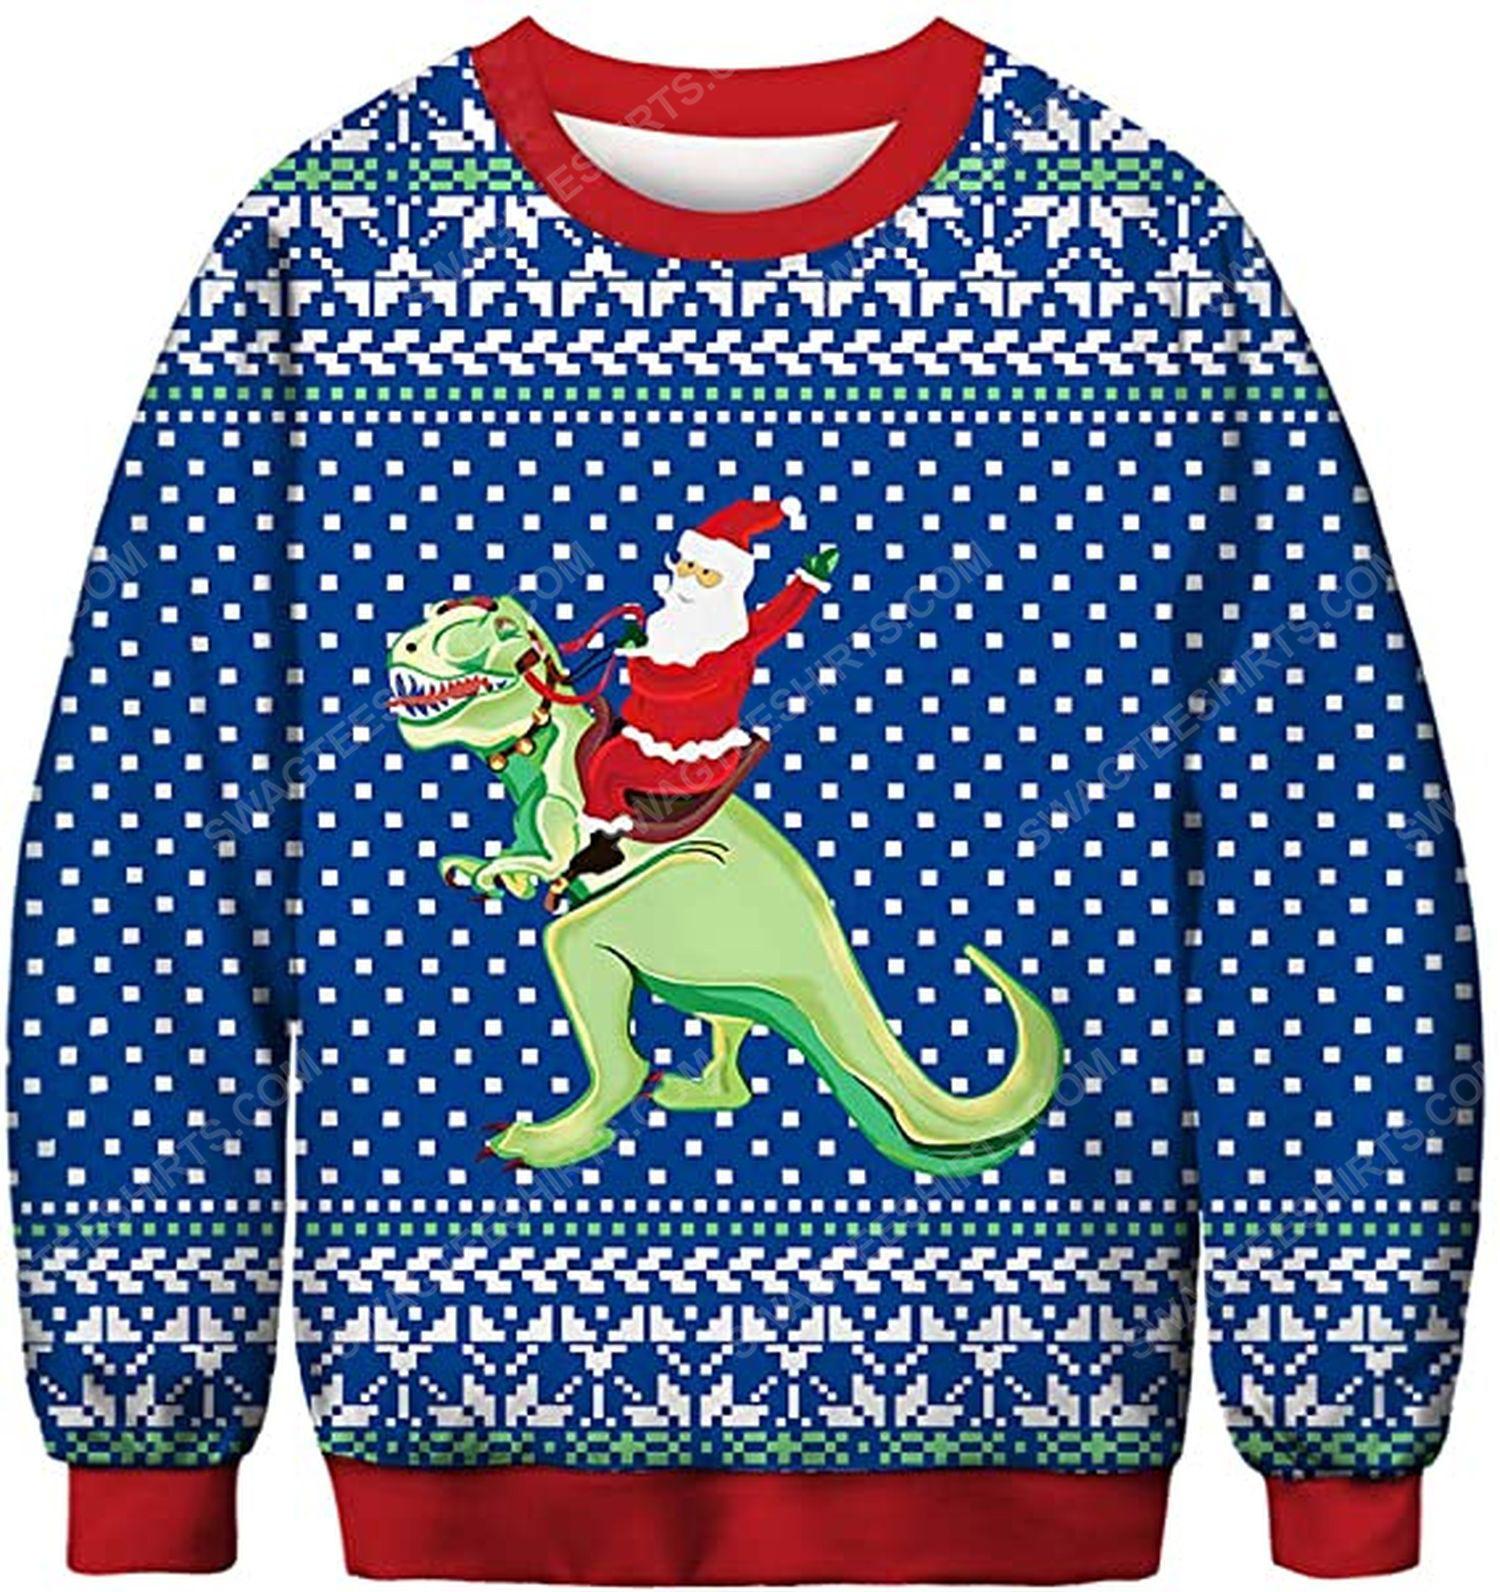 Santa claus riding a dinosaur full print ugly christmas sweater 2 - Copy (2)